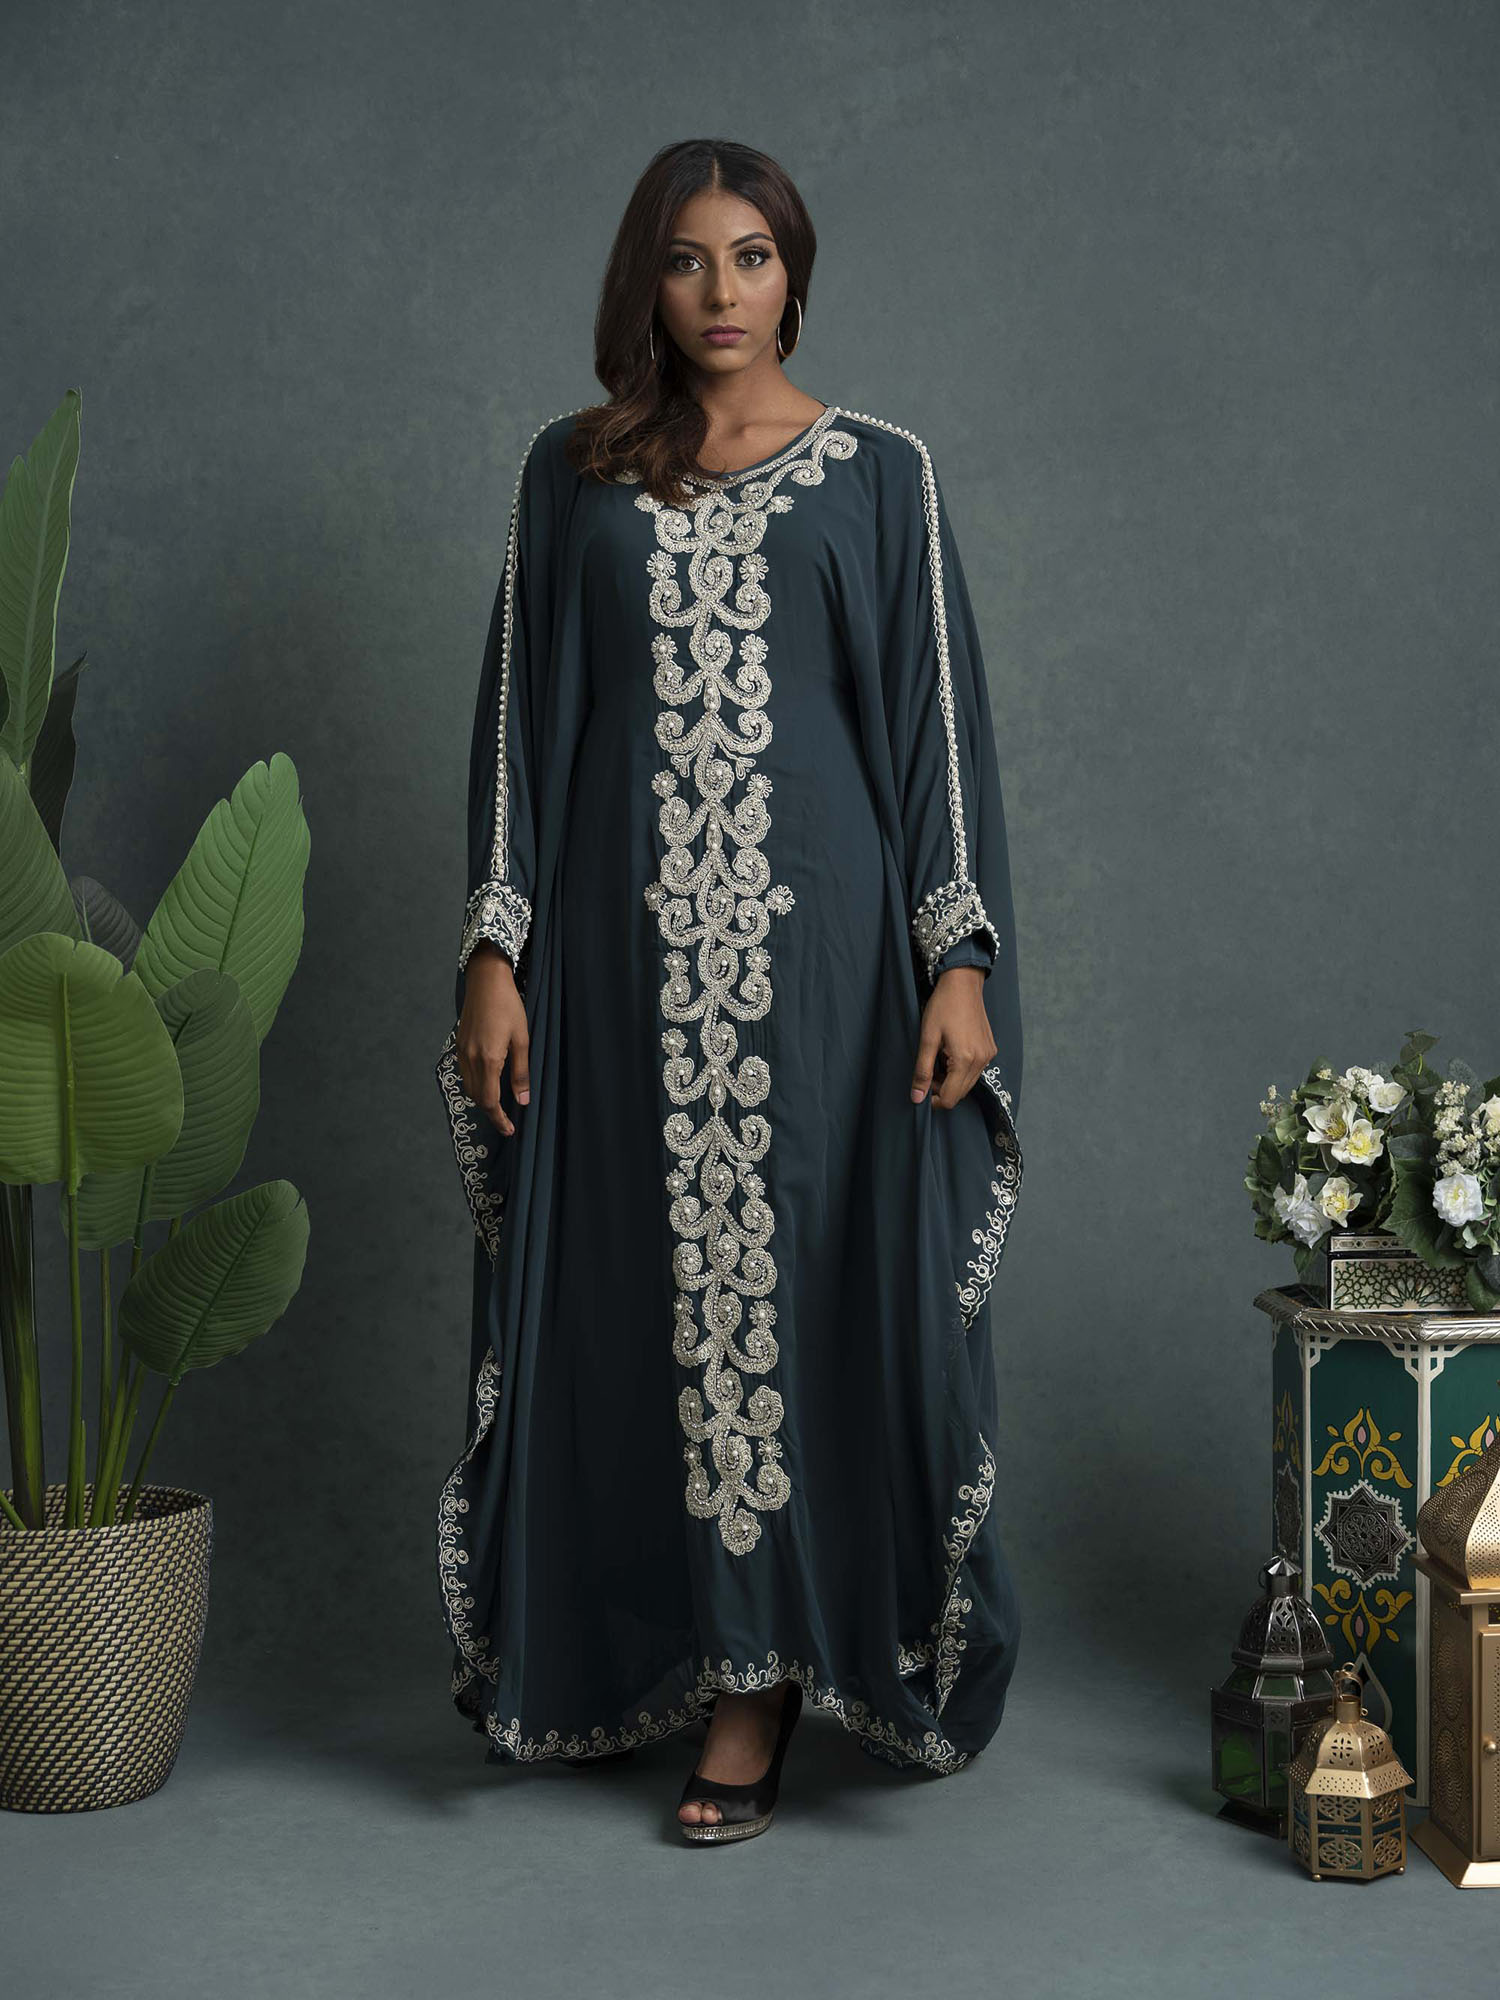 Fashion Photography Maghrebi Clothing Singapore Product Photographer COCO Creative Studio 3